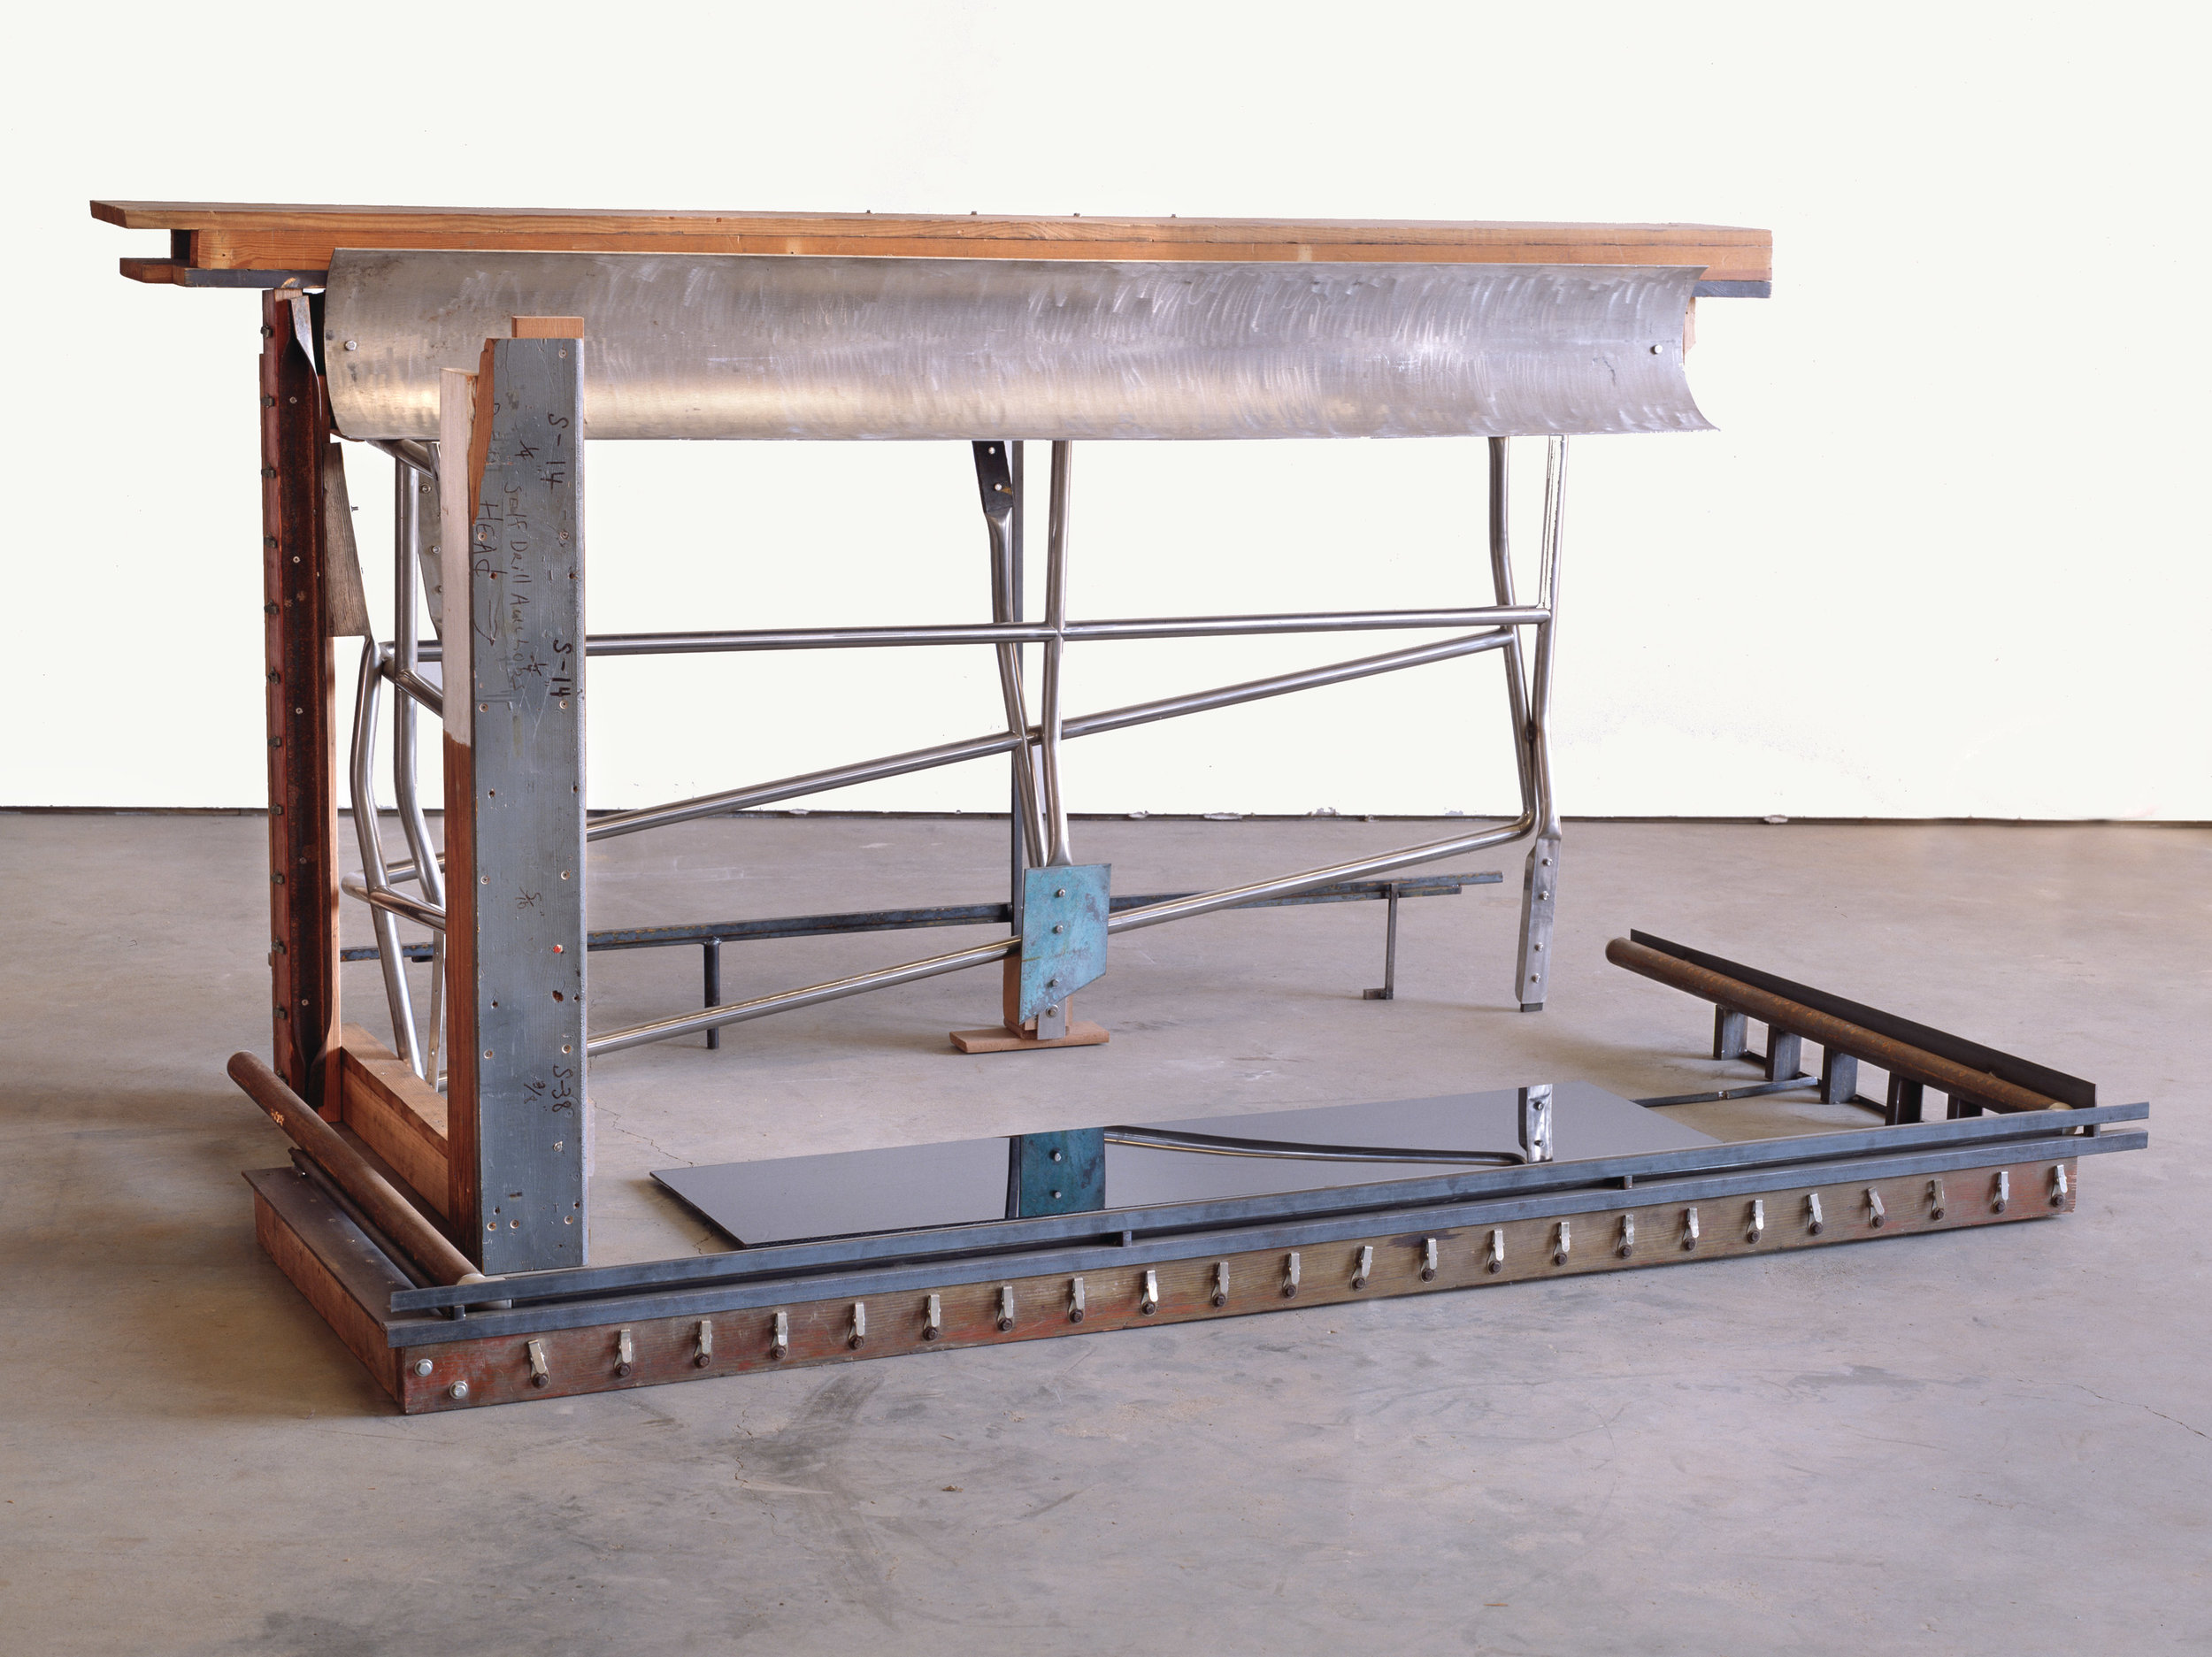 "Southern States (1990-95)  h. 54"" x w. 105"" x d. 66"" Wood, steel, stainless steel, galvanized steel, bronze, aluminum, Plexiglas"